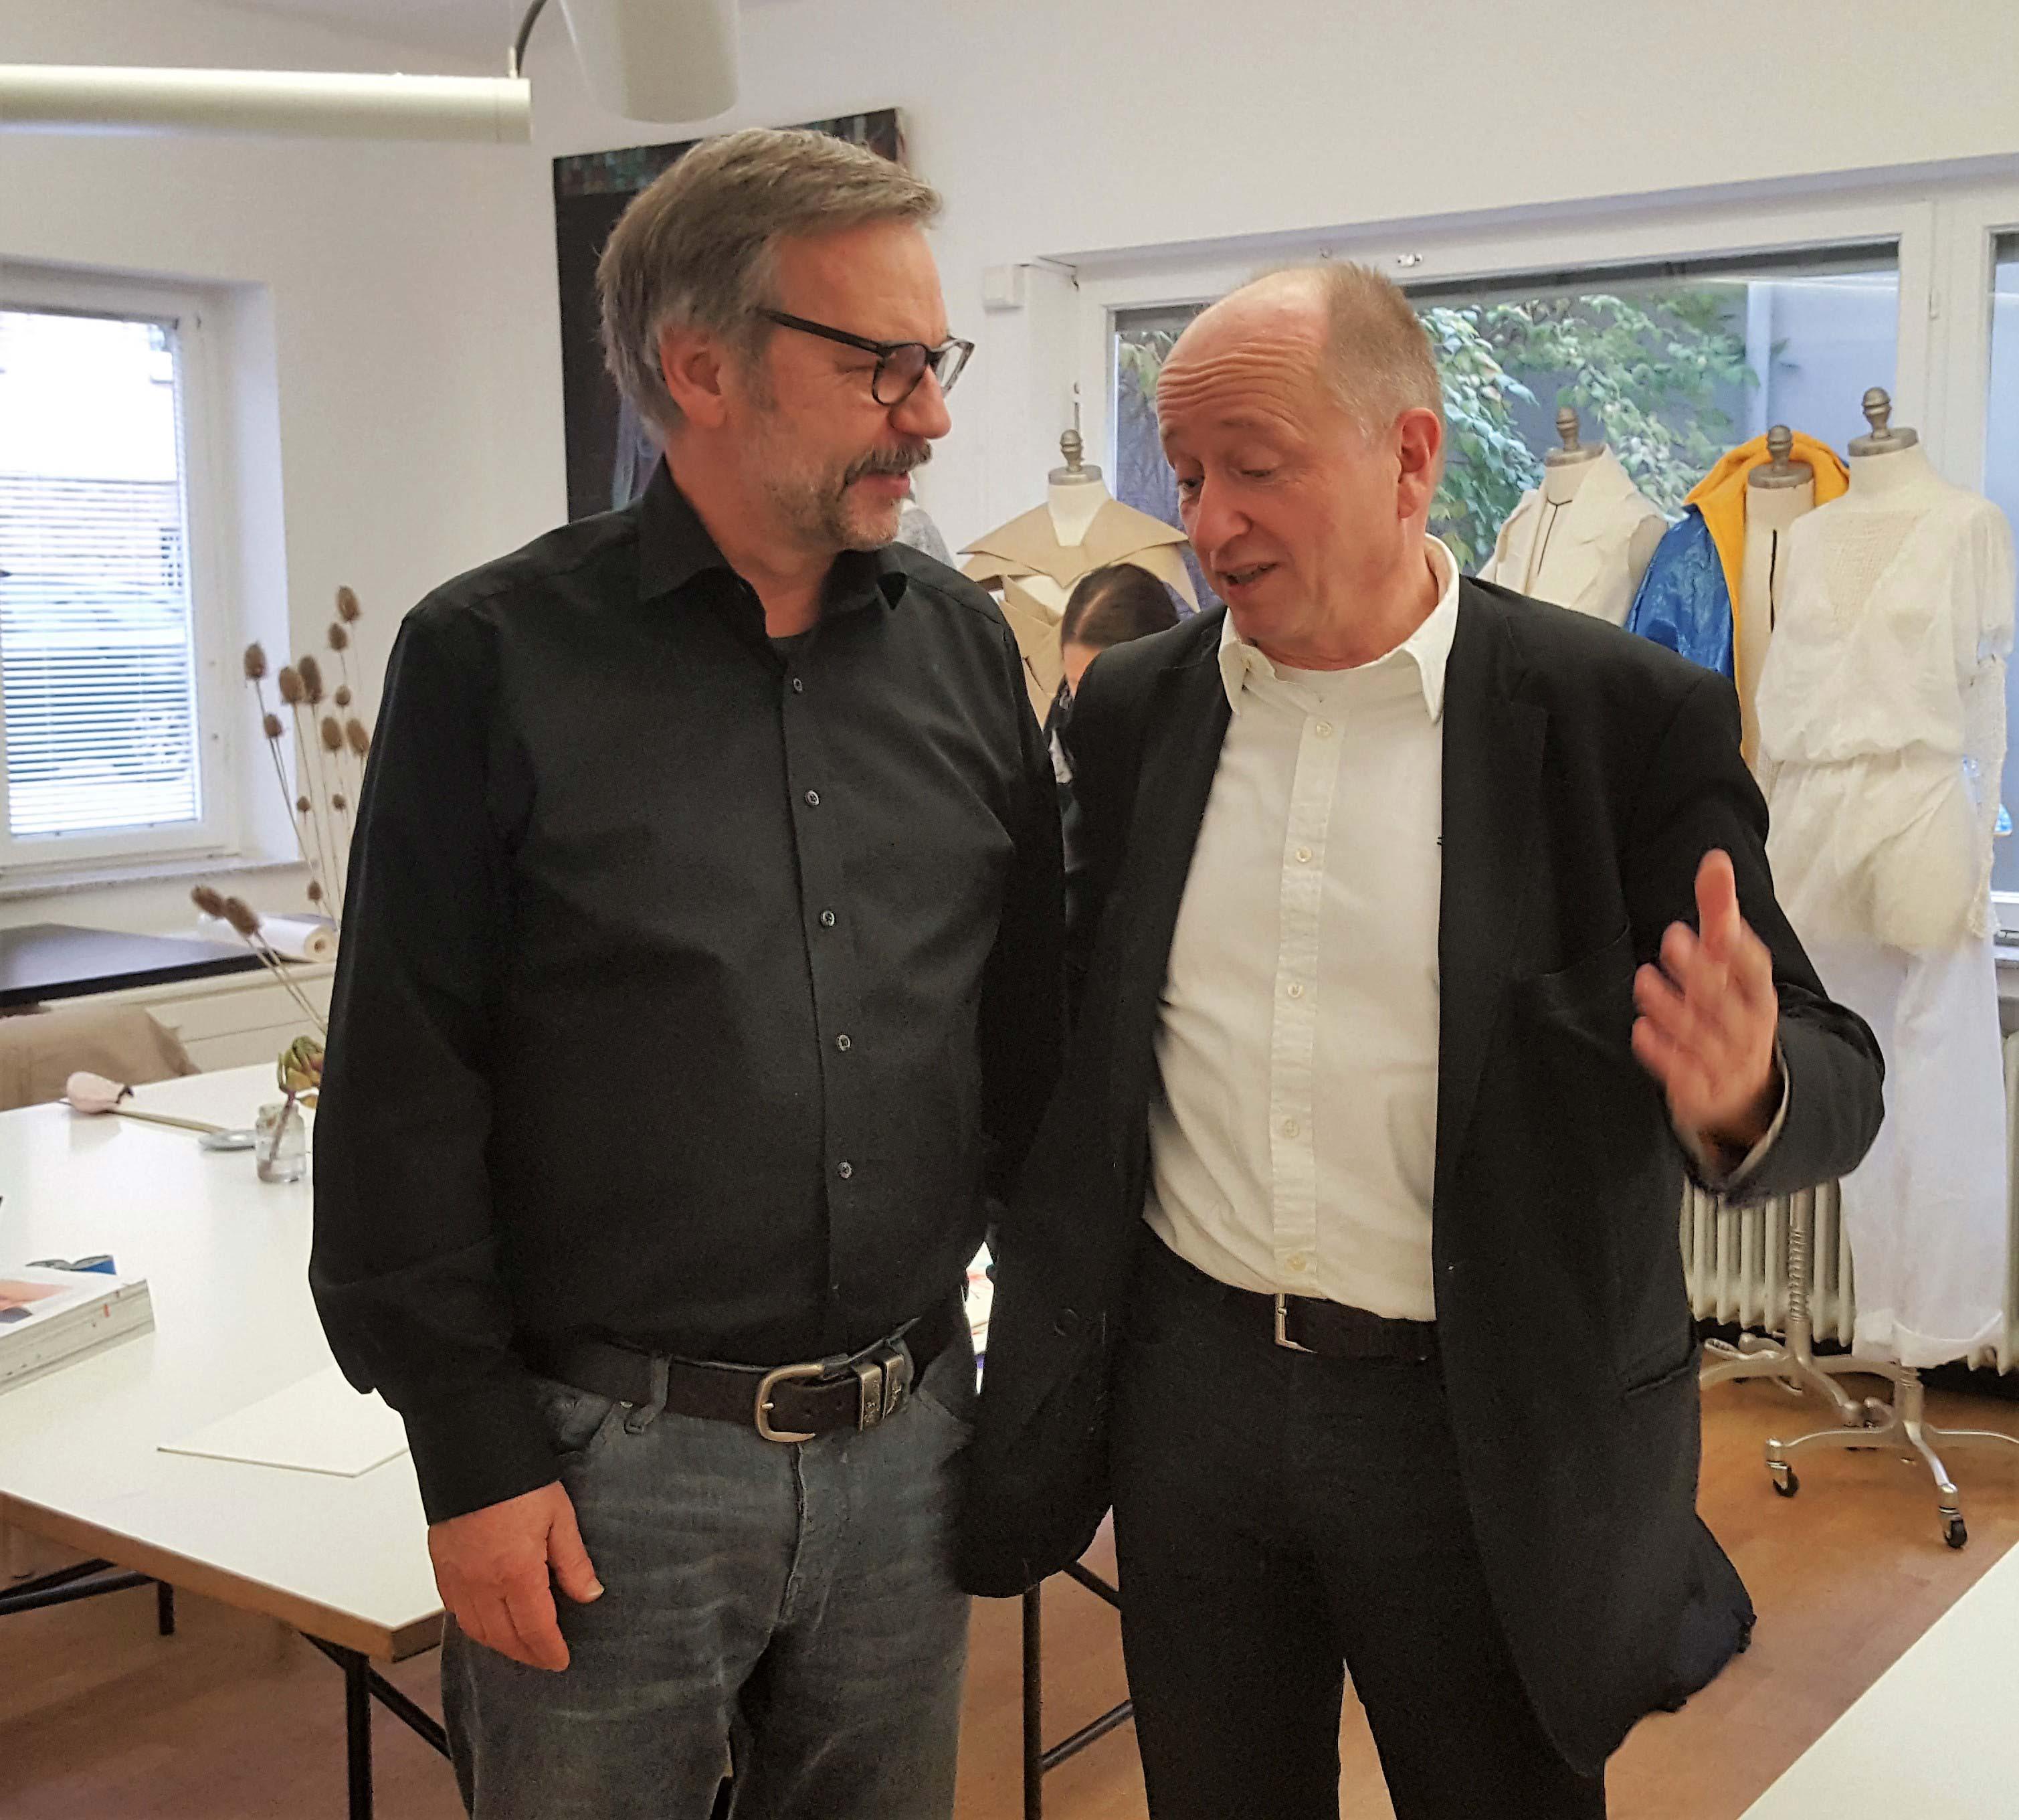 Talentstudio_Mappenkurs_Hochschule_Halle